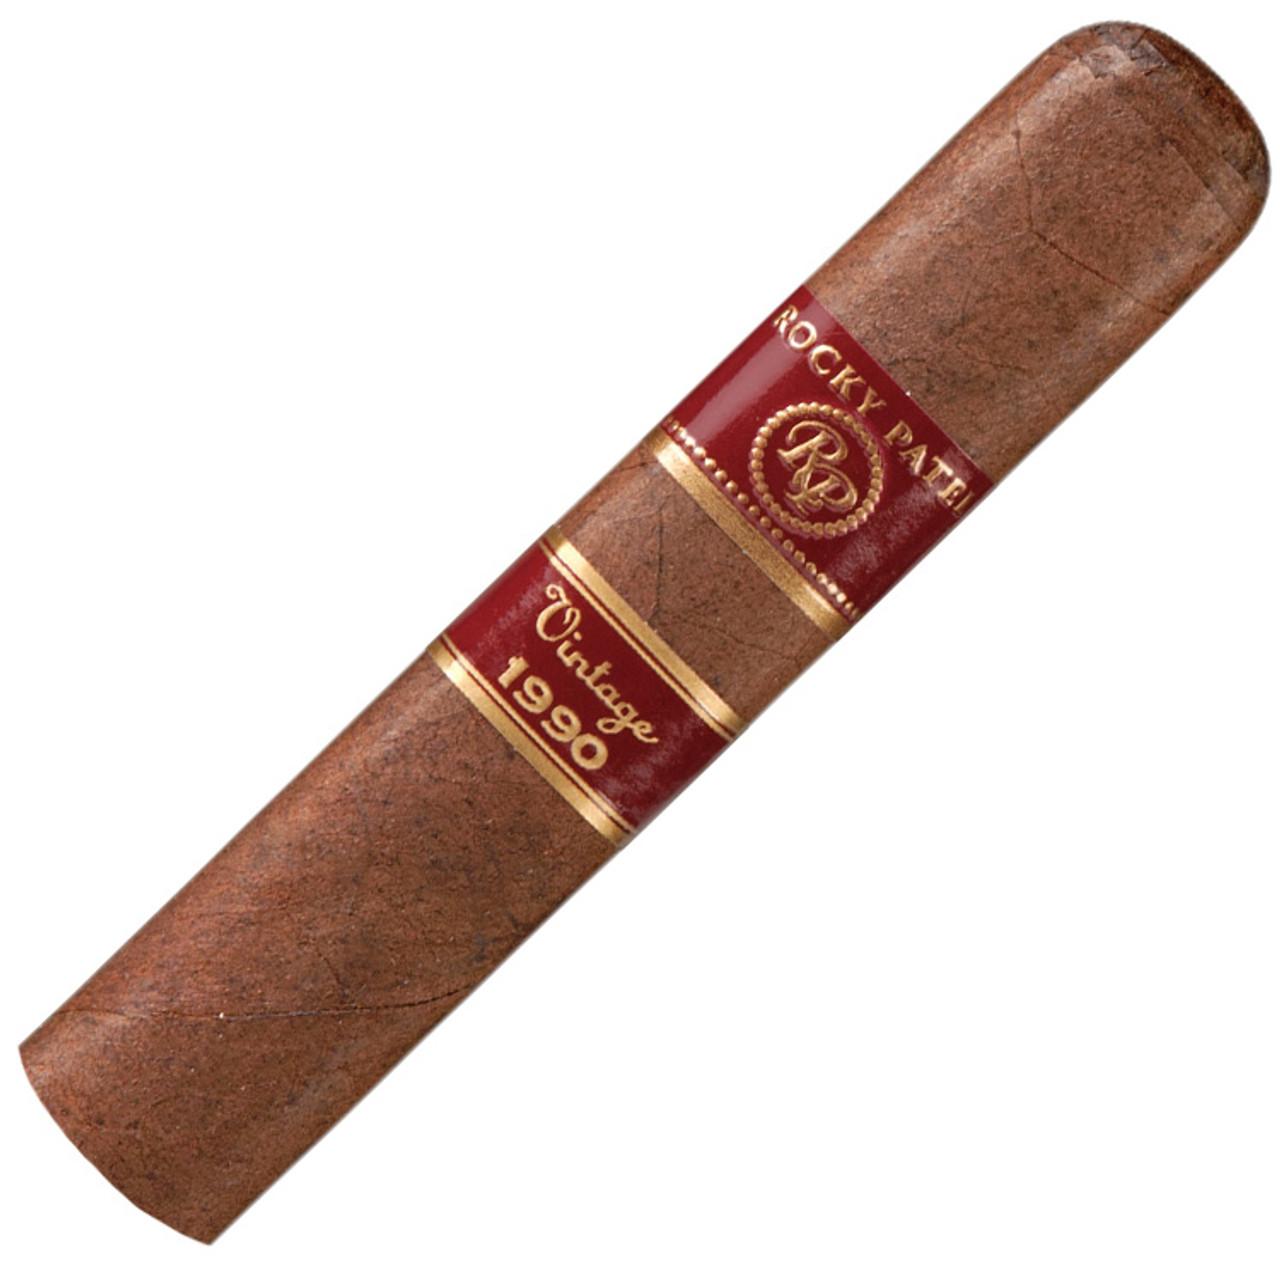 Rocky Patel Vintage 1990 Sixty Cigars - 6 x 60 (Box of 20)